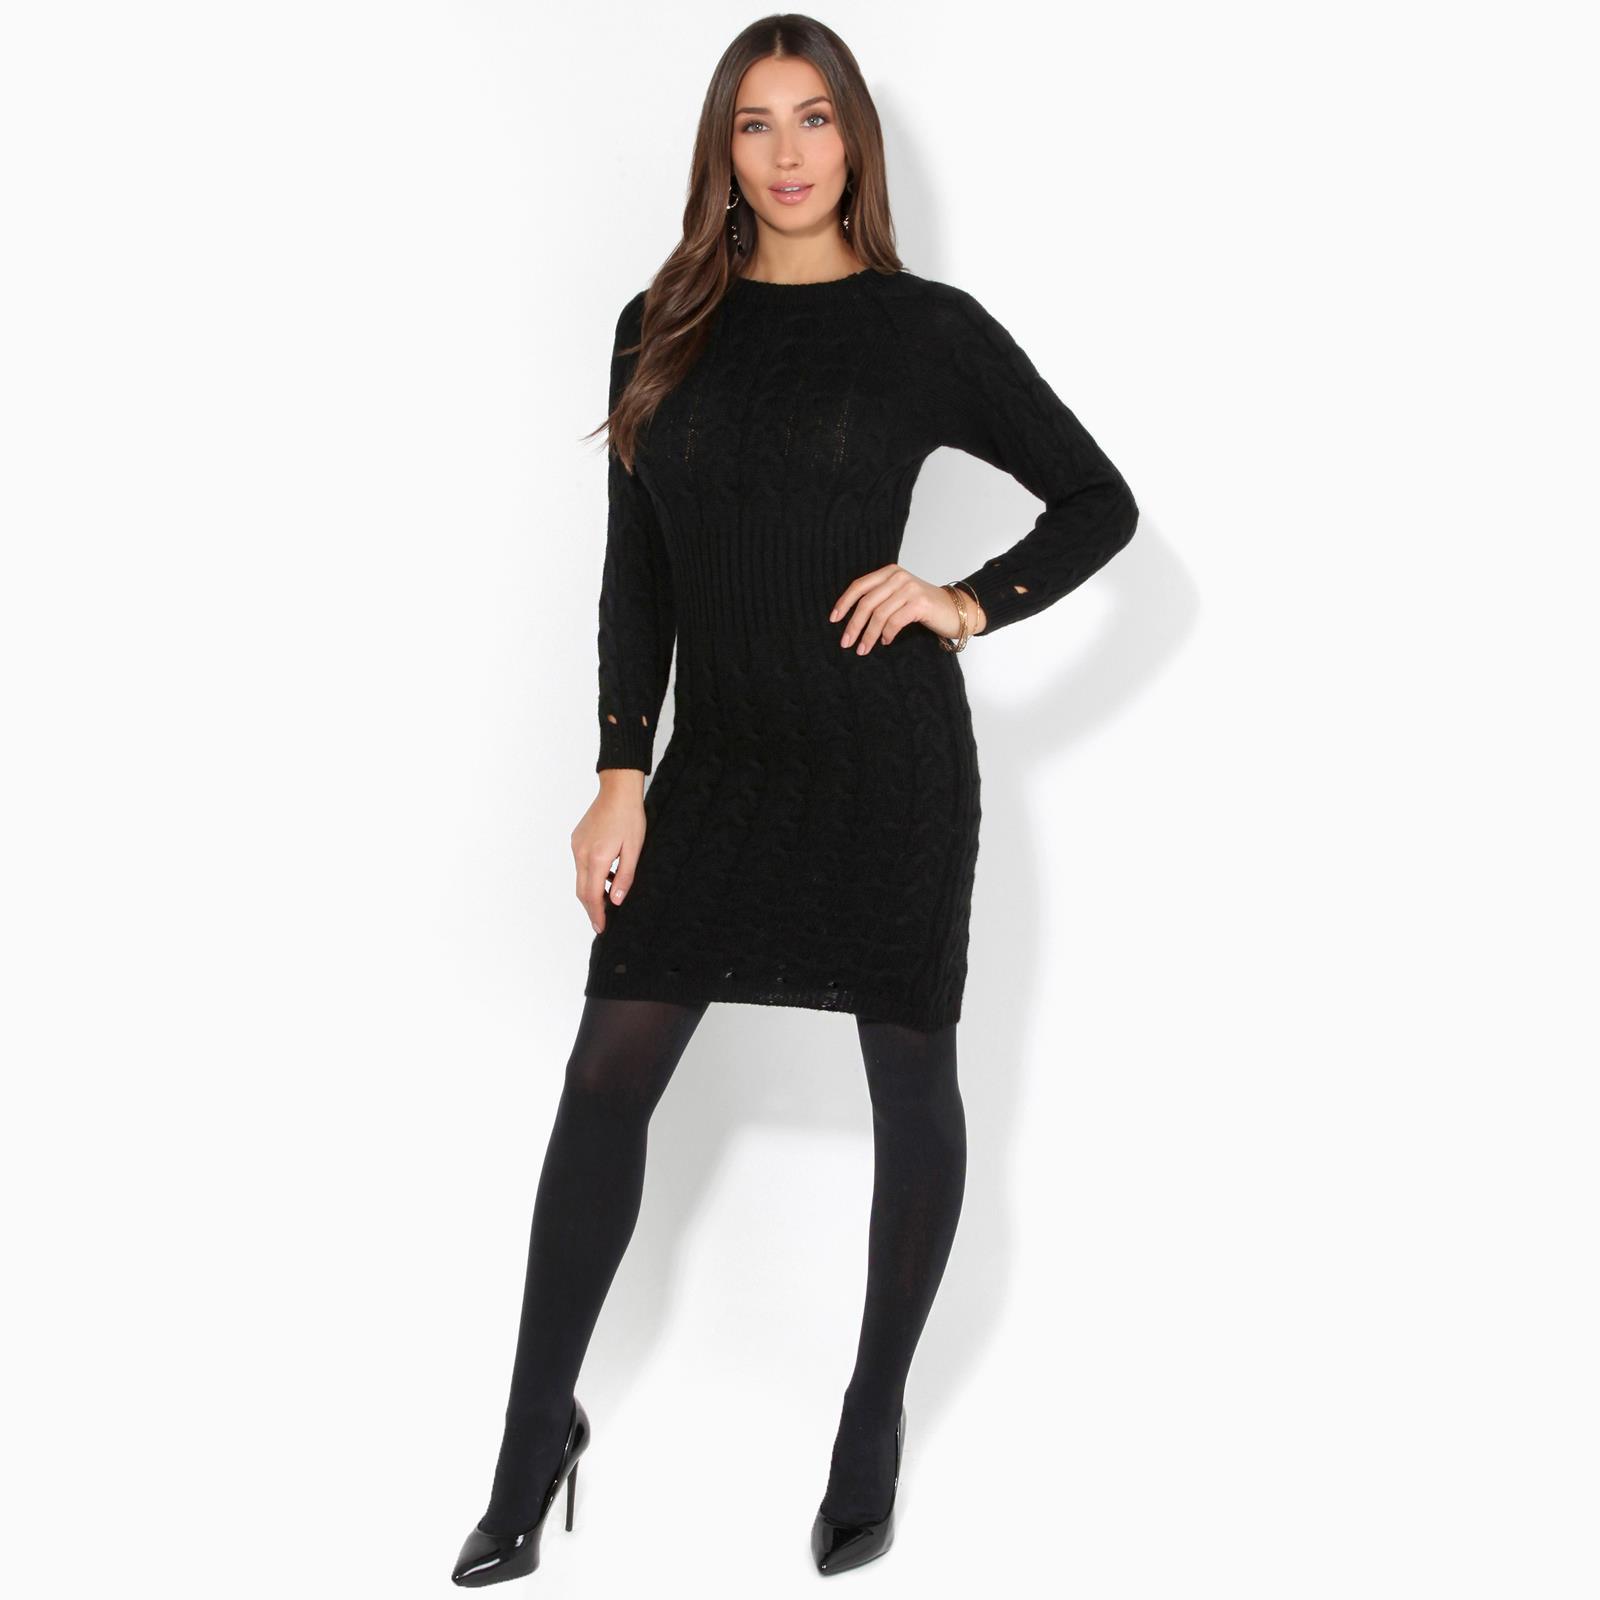 Womens-Ladies-Jumper-Dress-Longsleeve-Mini-Warm-Winter-Knit-Top-Bodycon thumbnail 6